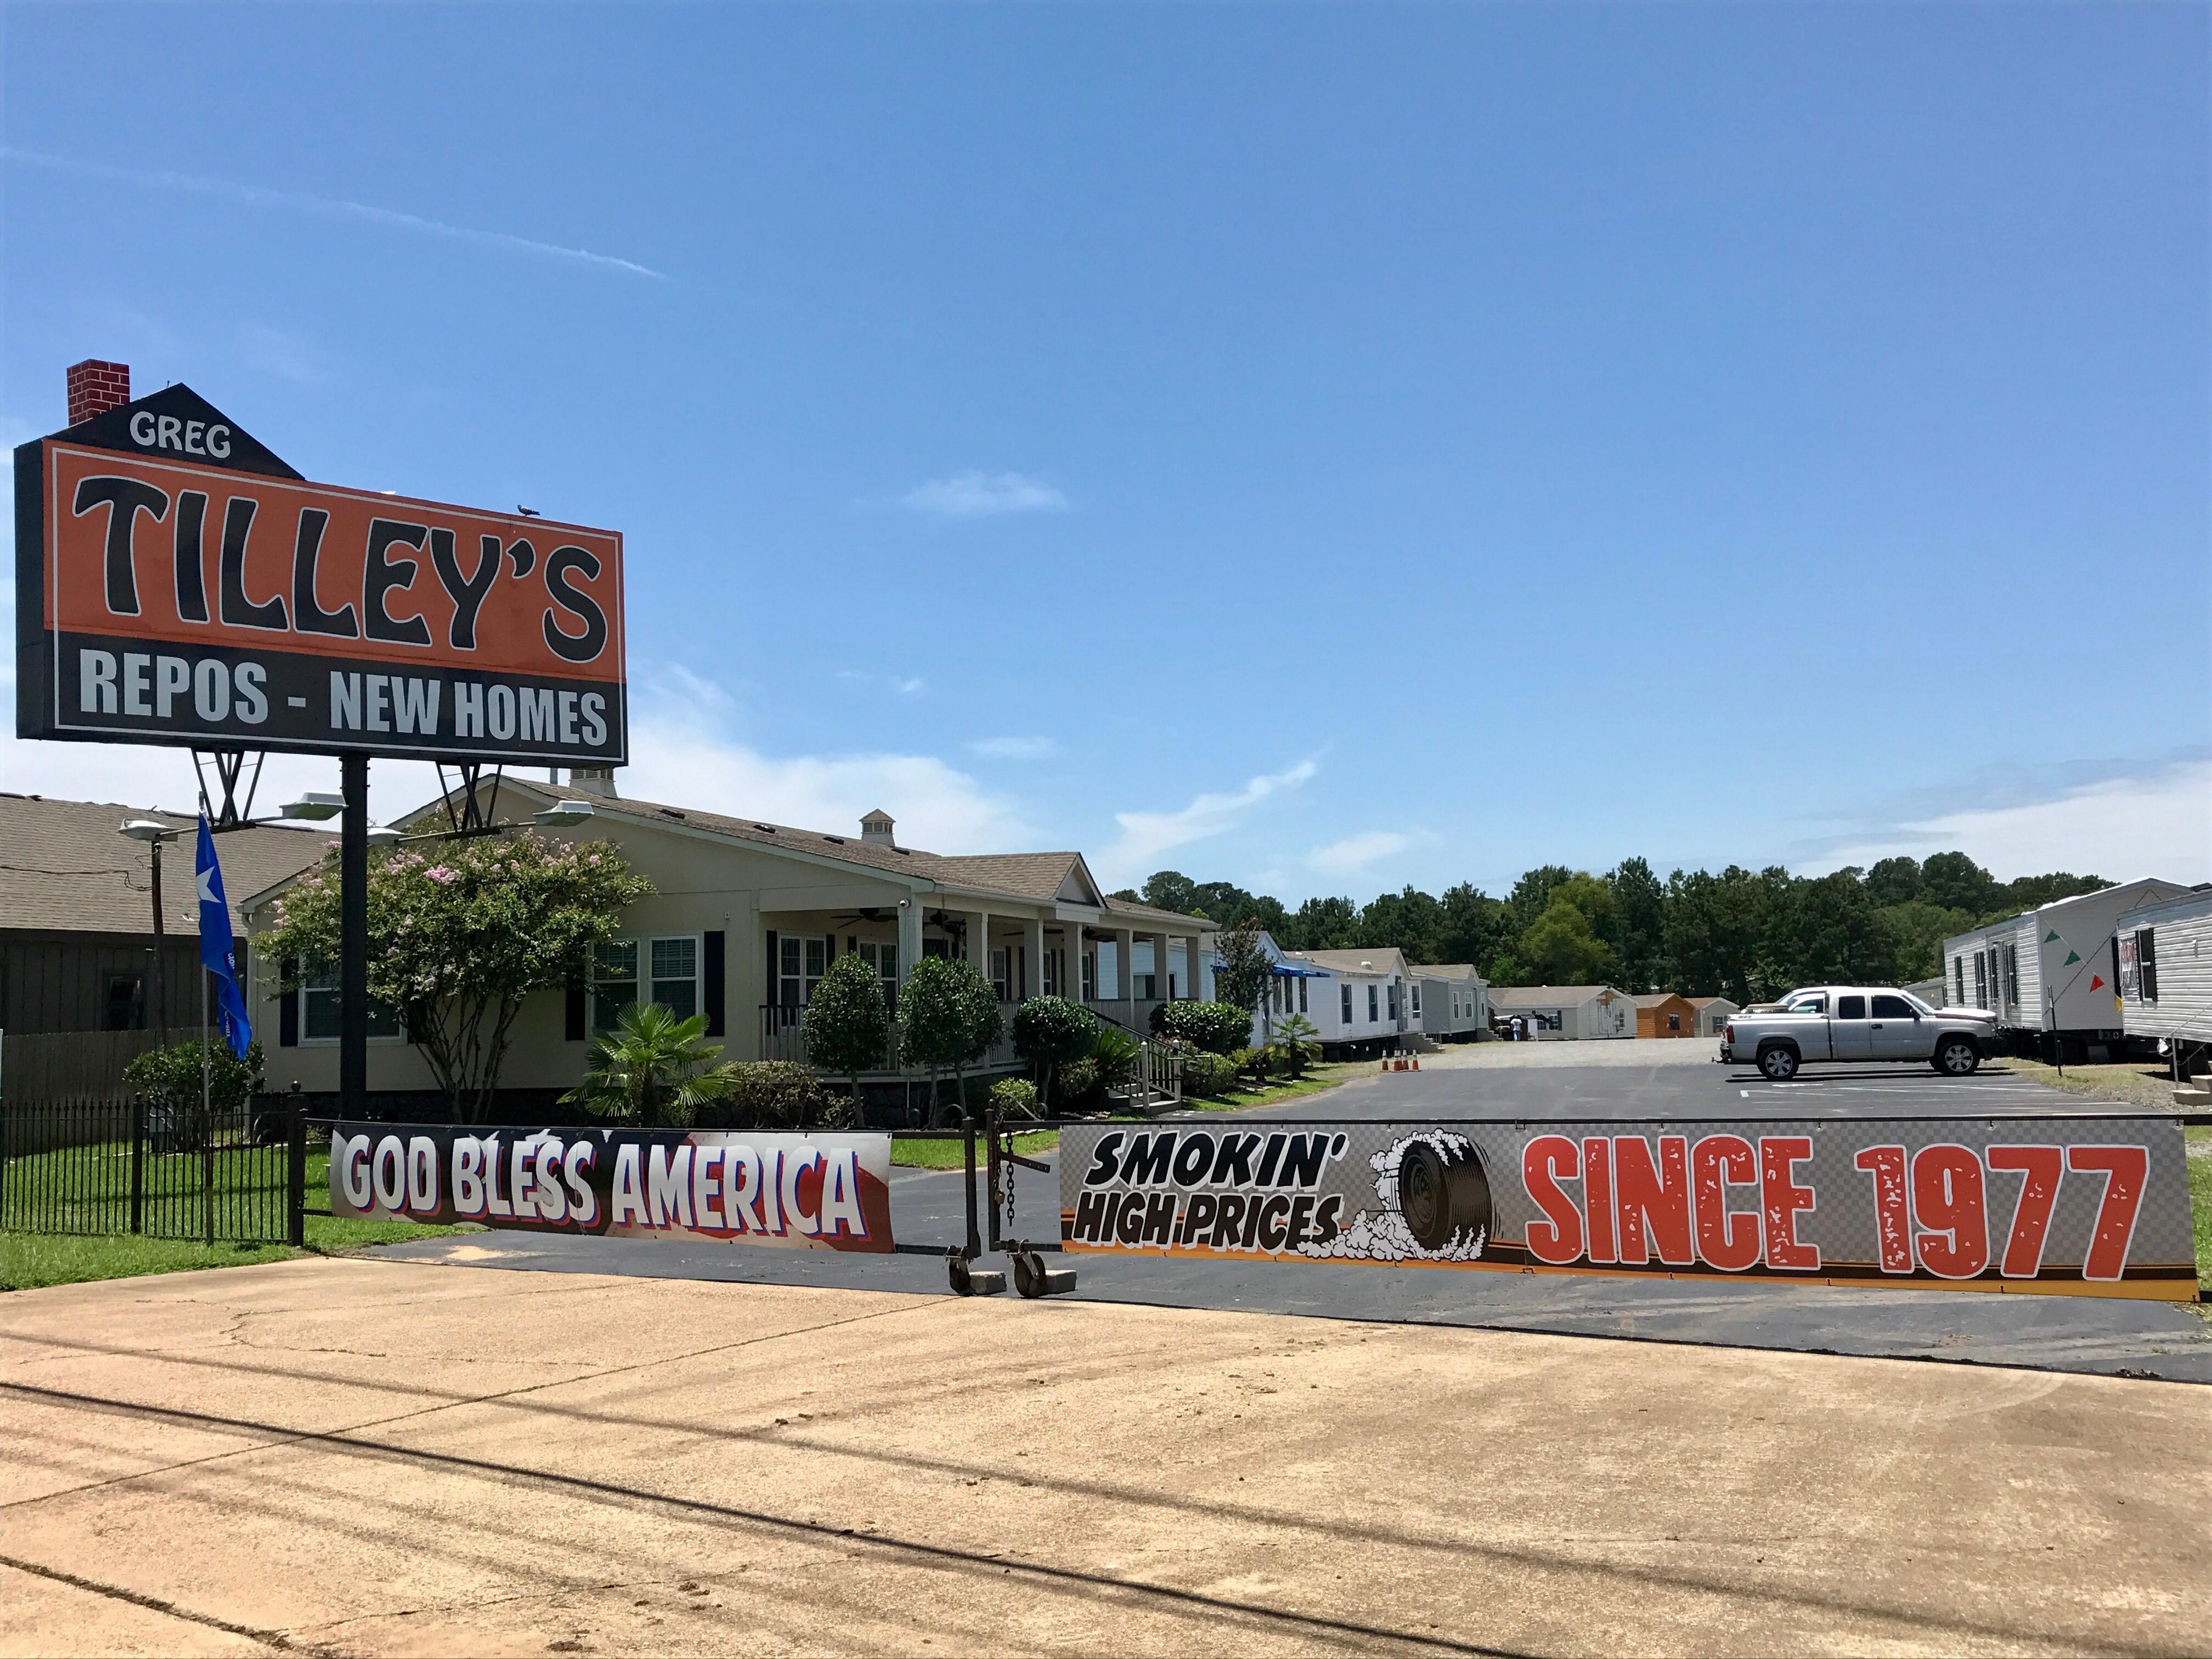 Greg Tilley 39 S Repos New Homes In Shreveport La Whitepages